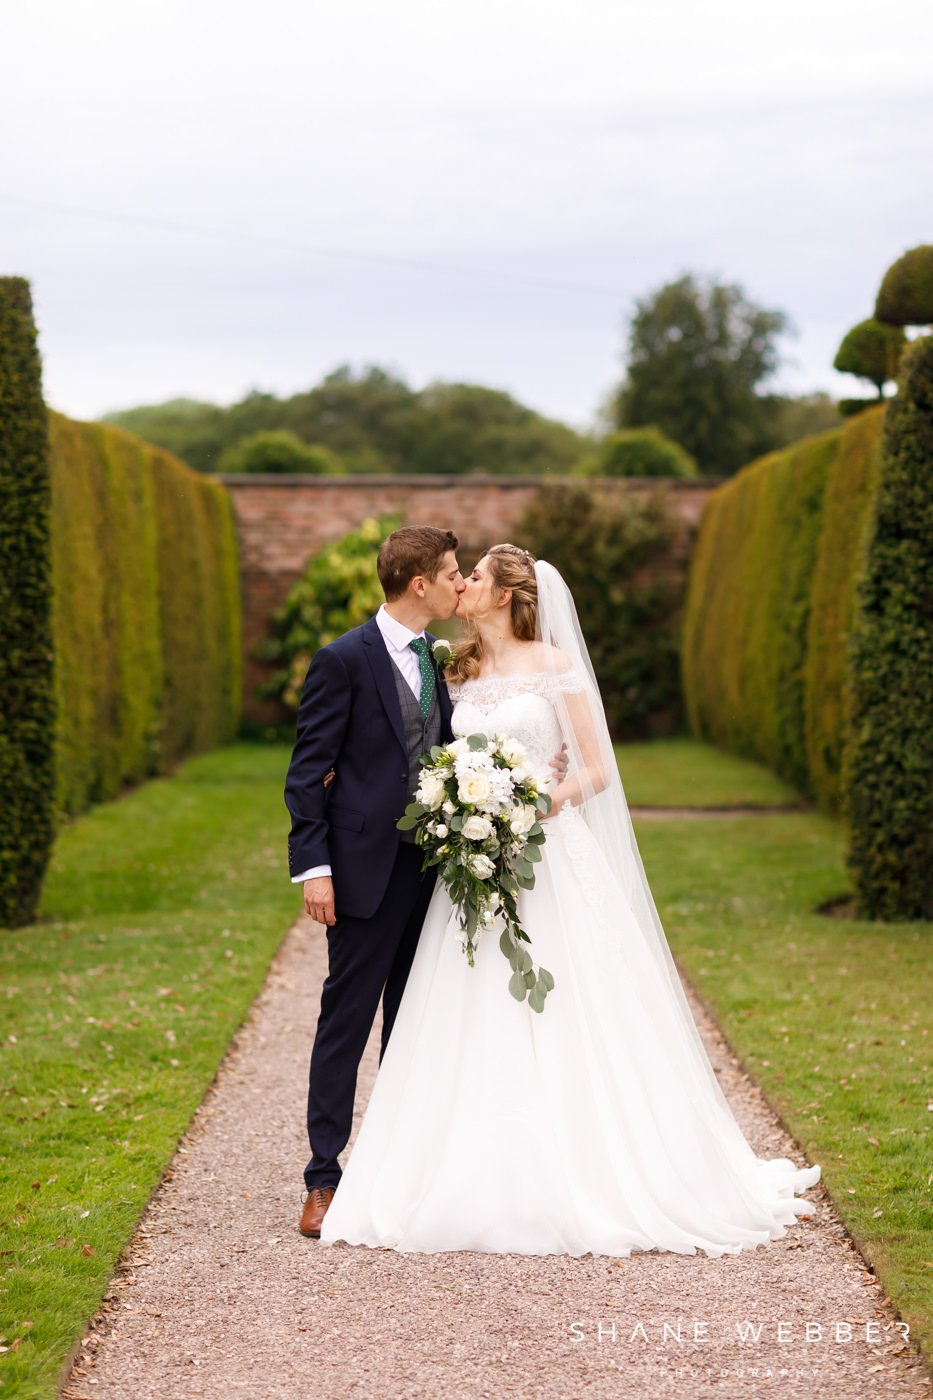 arely hall wedding photography